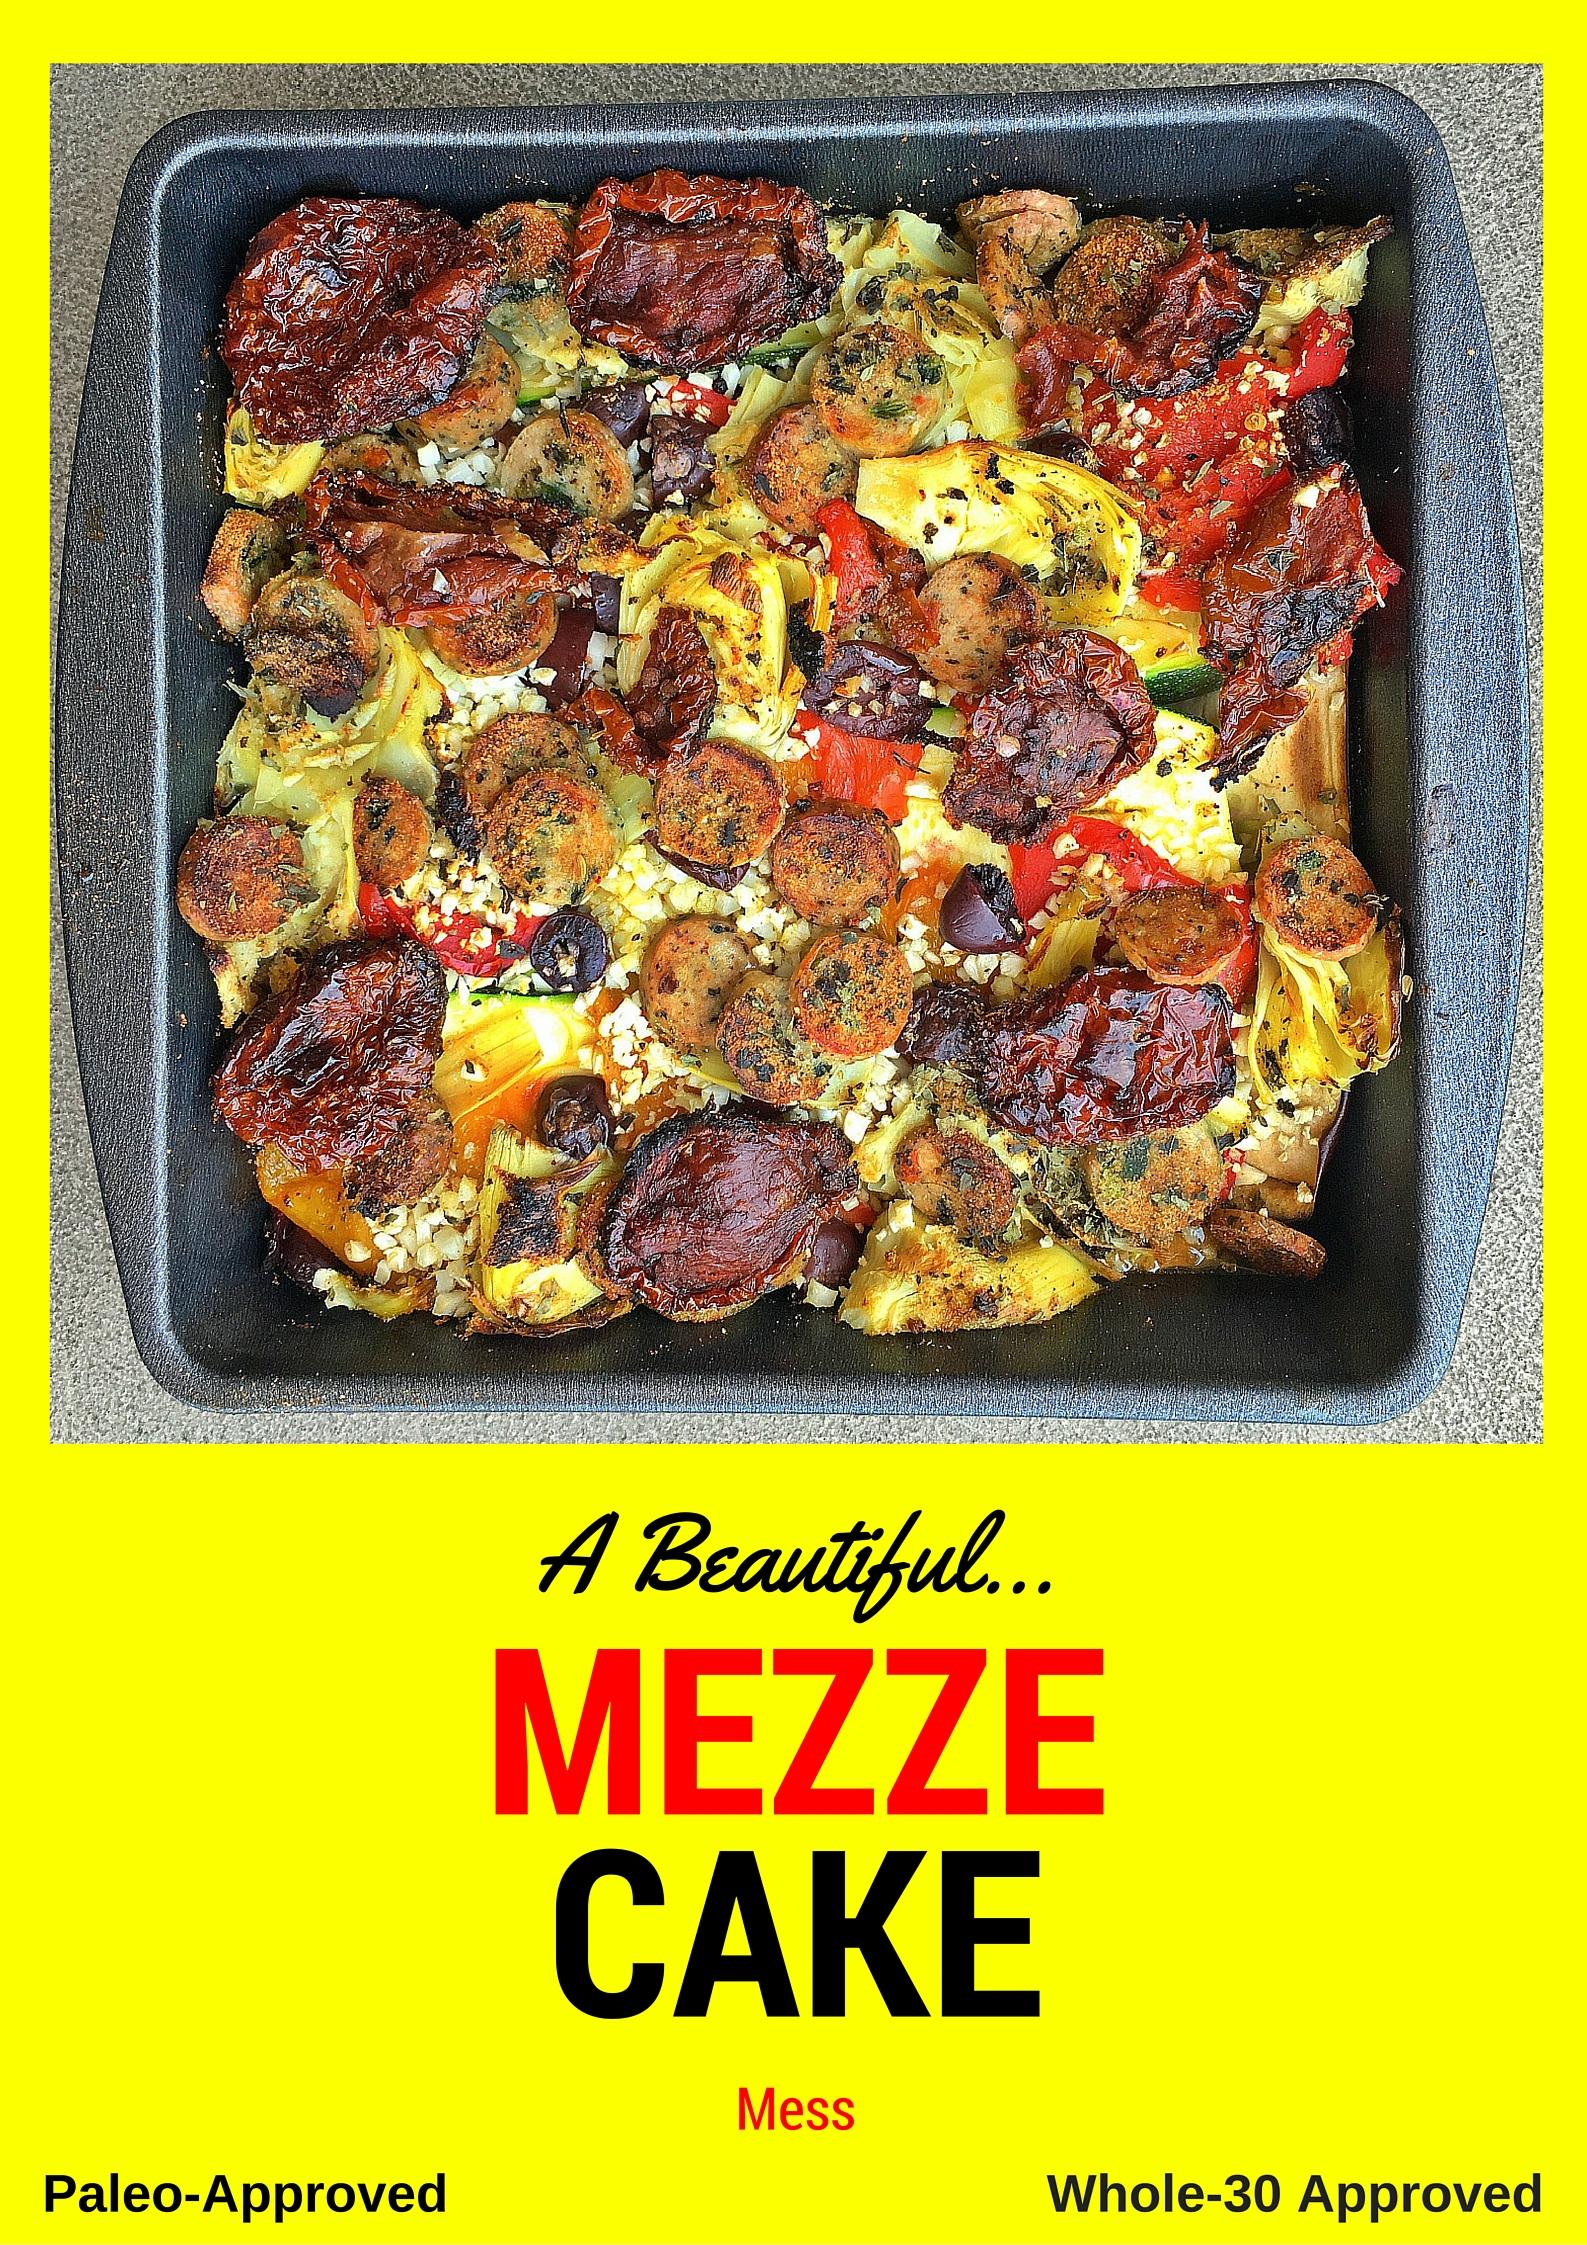 Mezze Cake